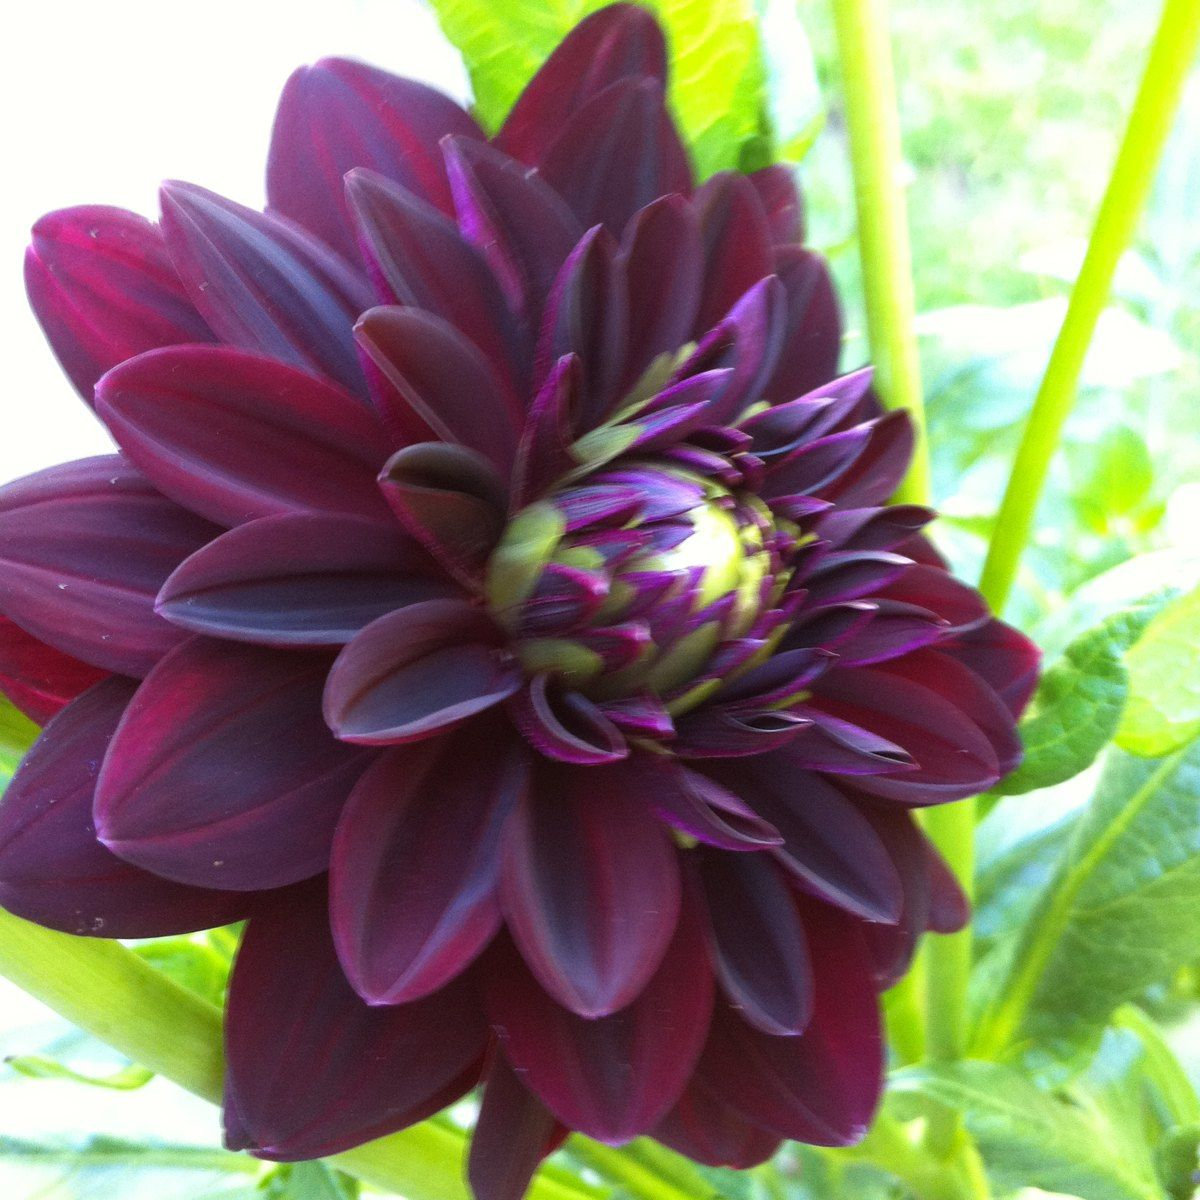 Dahlia flower var arabian nights dahilas pinterest dahlia dahlia flower var arabian nights izmirmasajfo